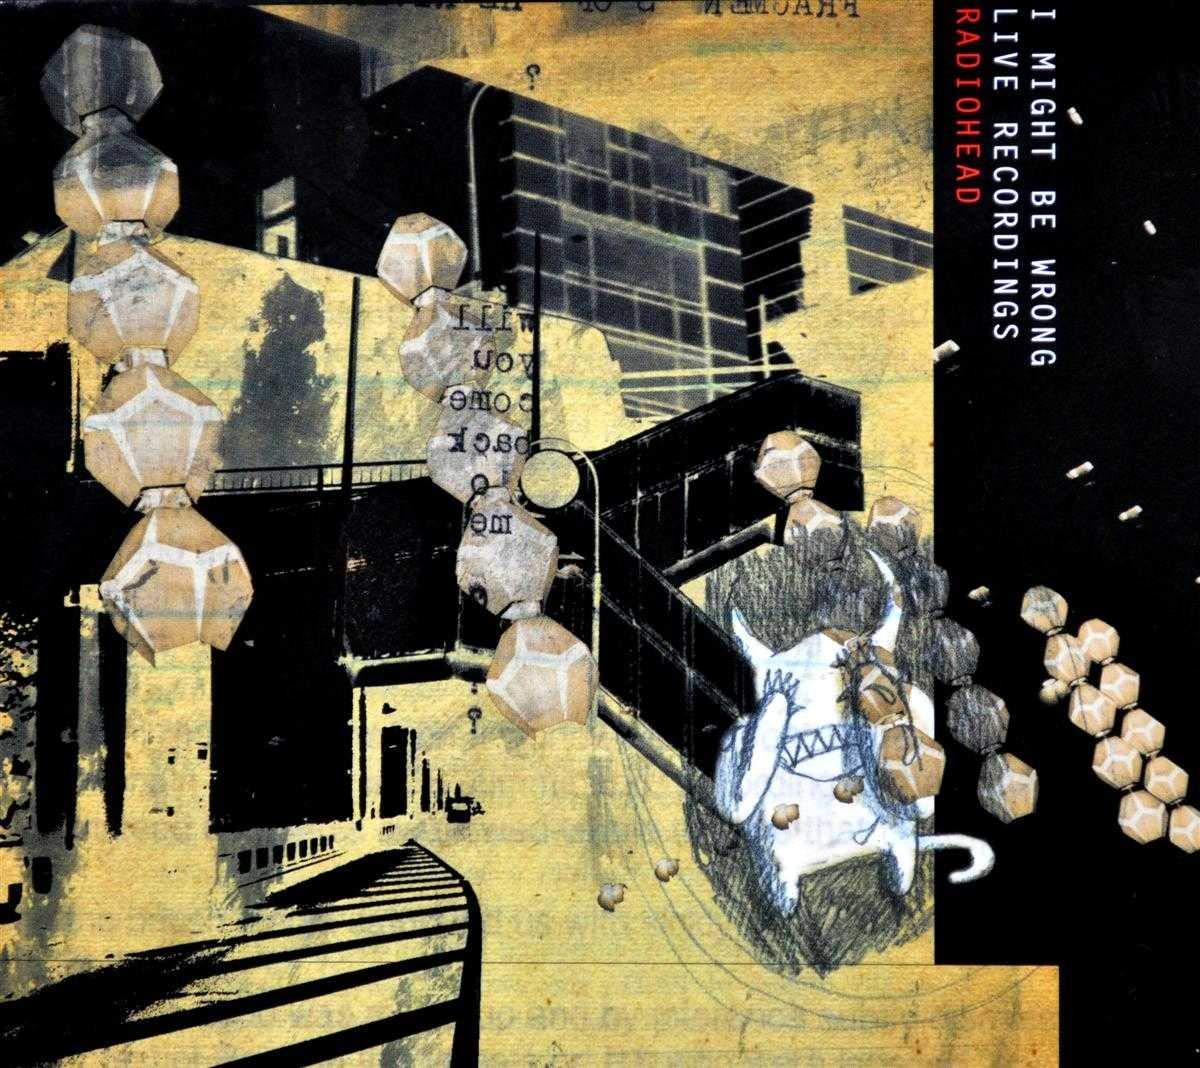 I Might Be Wrong: Radiohead: Amazon.es: Música